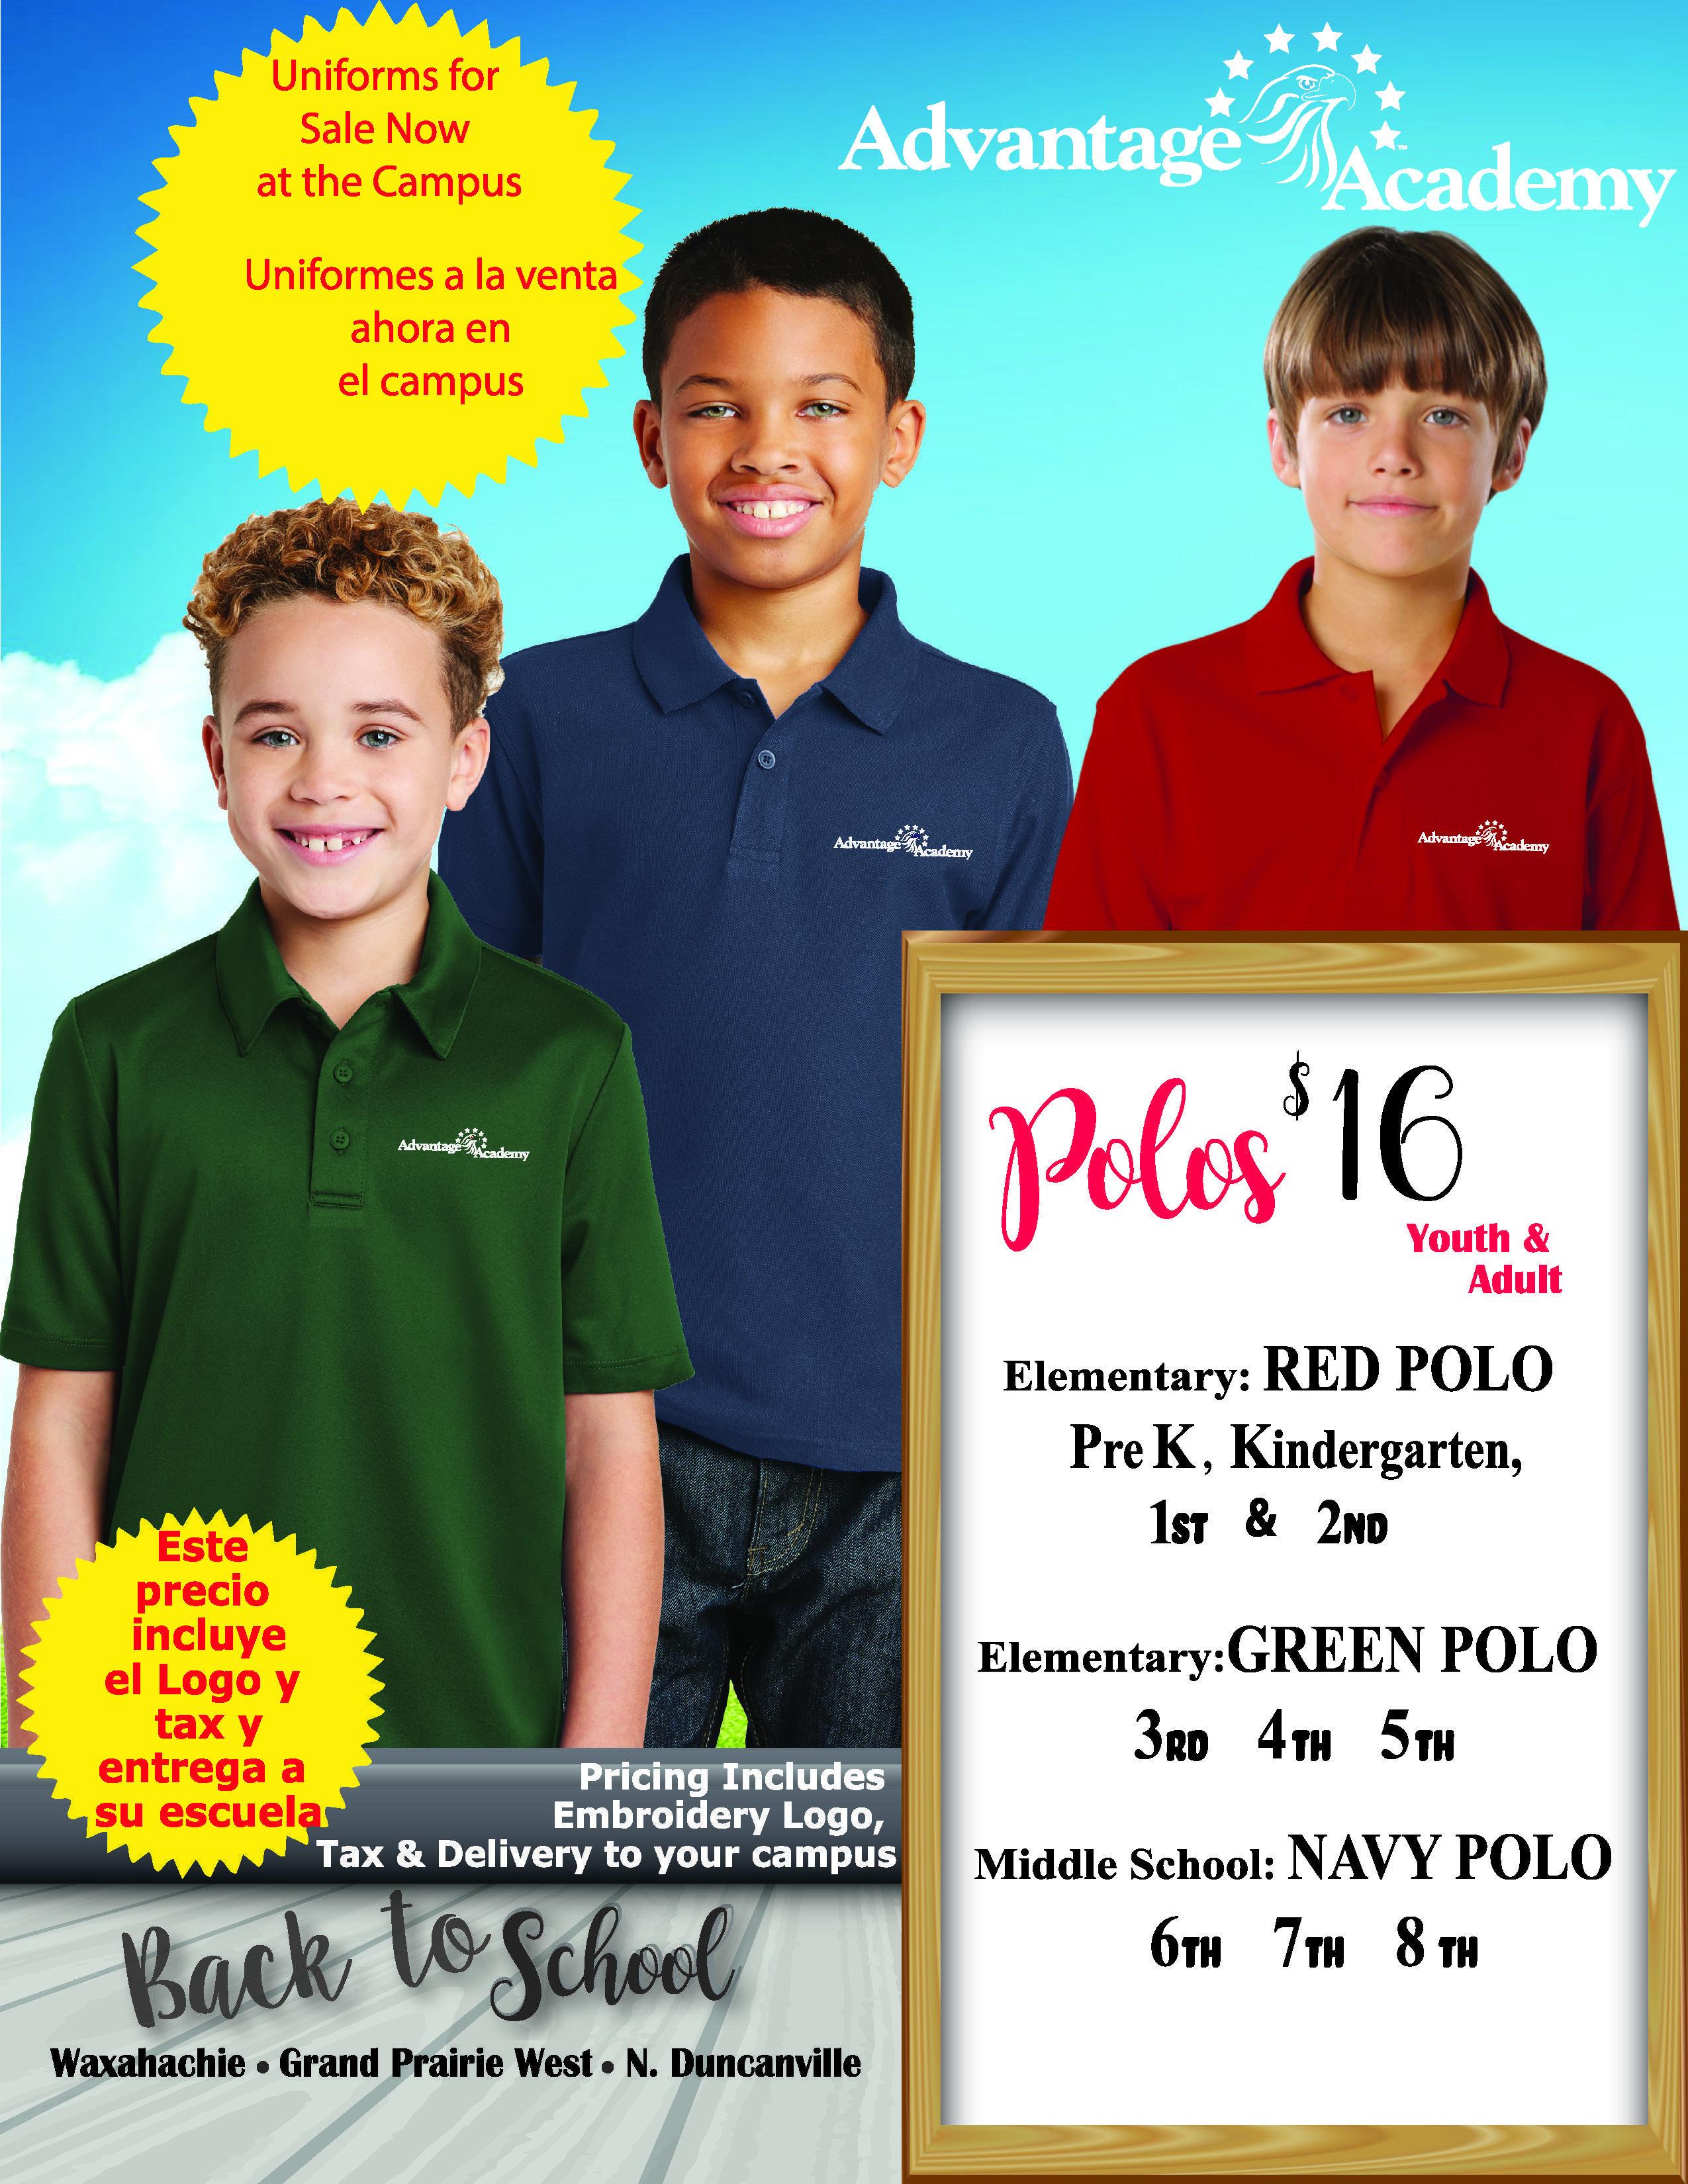 Advantage Academy dress code polo shirts